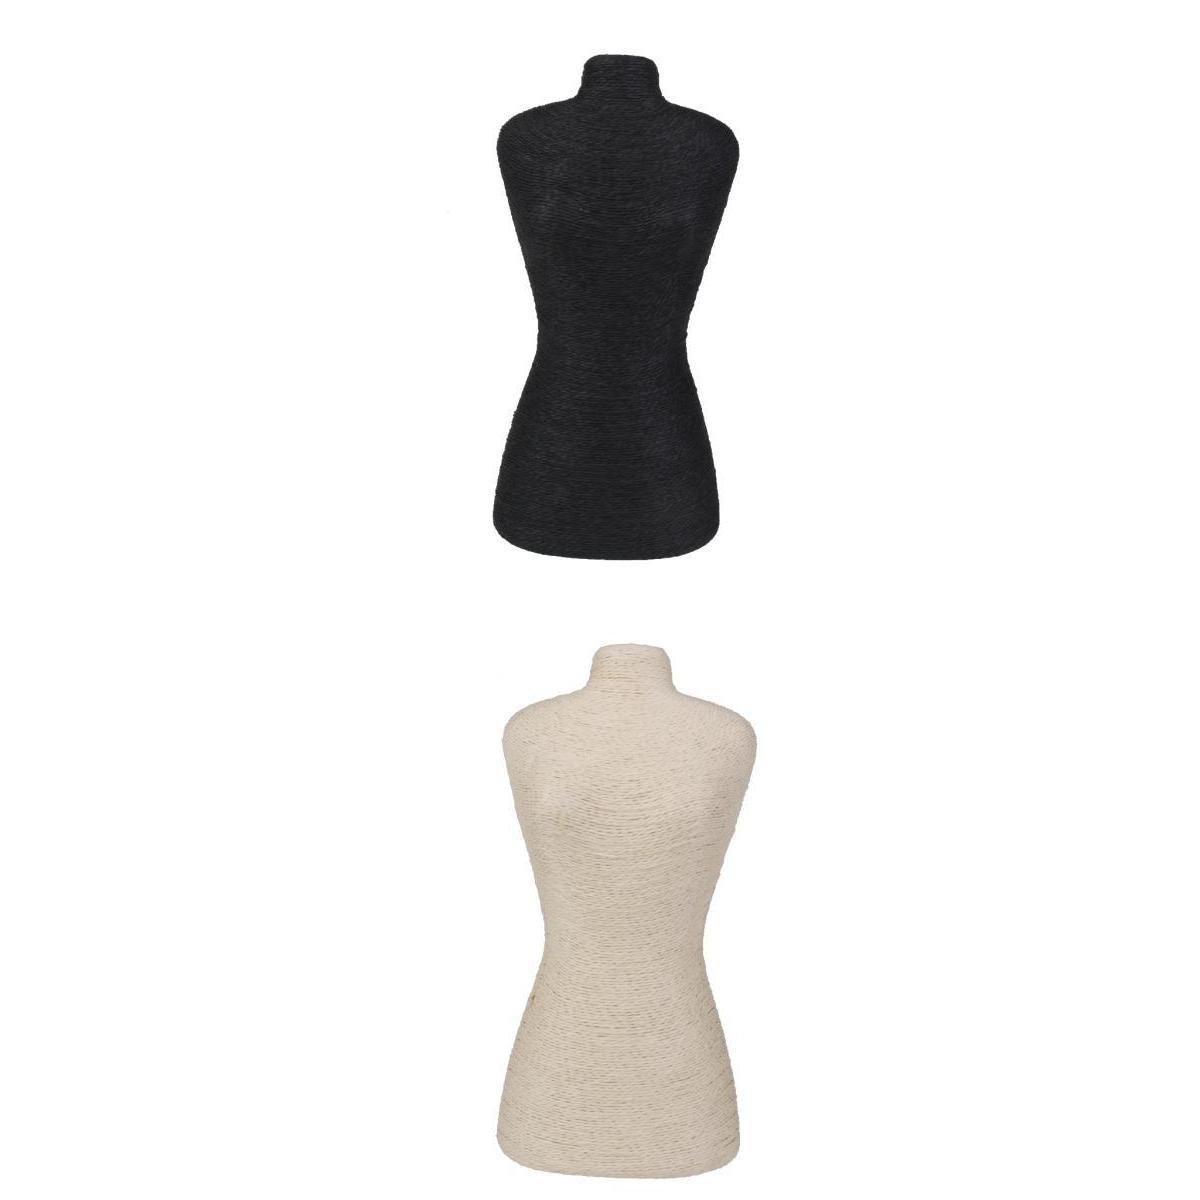 MagiDeal Female Dress Form Mannequin Body Torso Black Beige non-brand